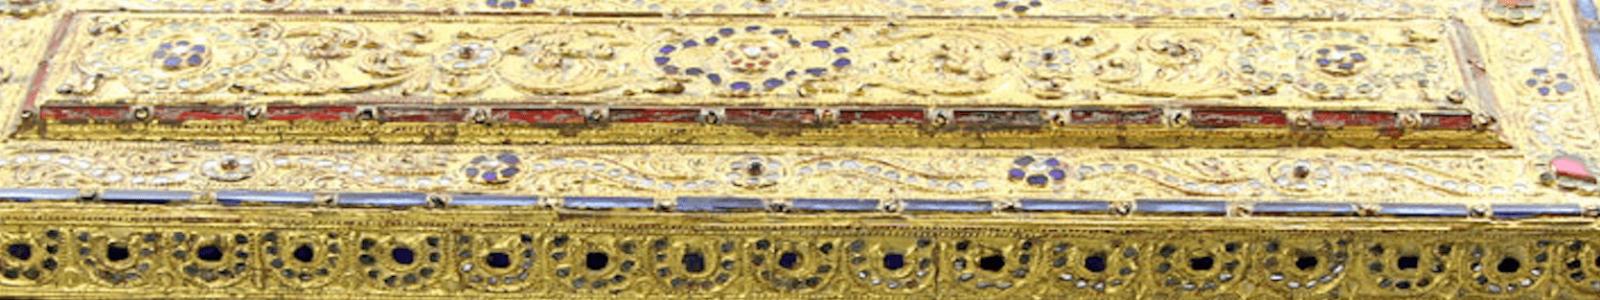 Art, Antiques, Jewelry